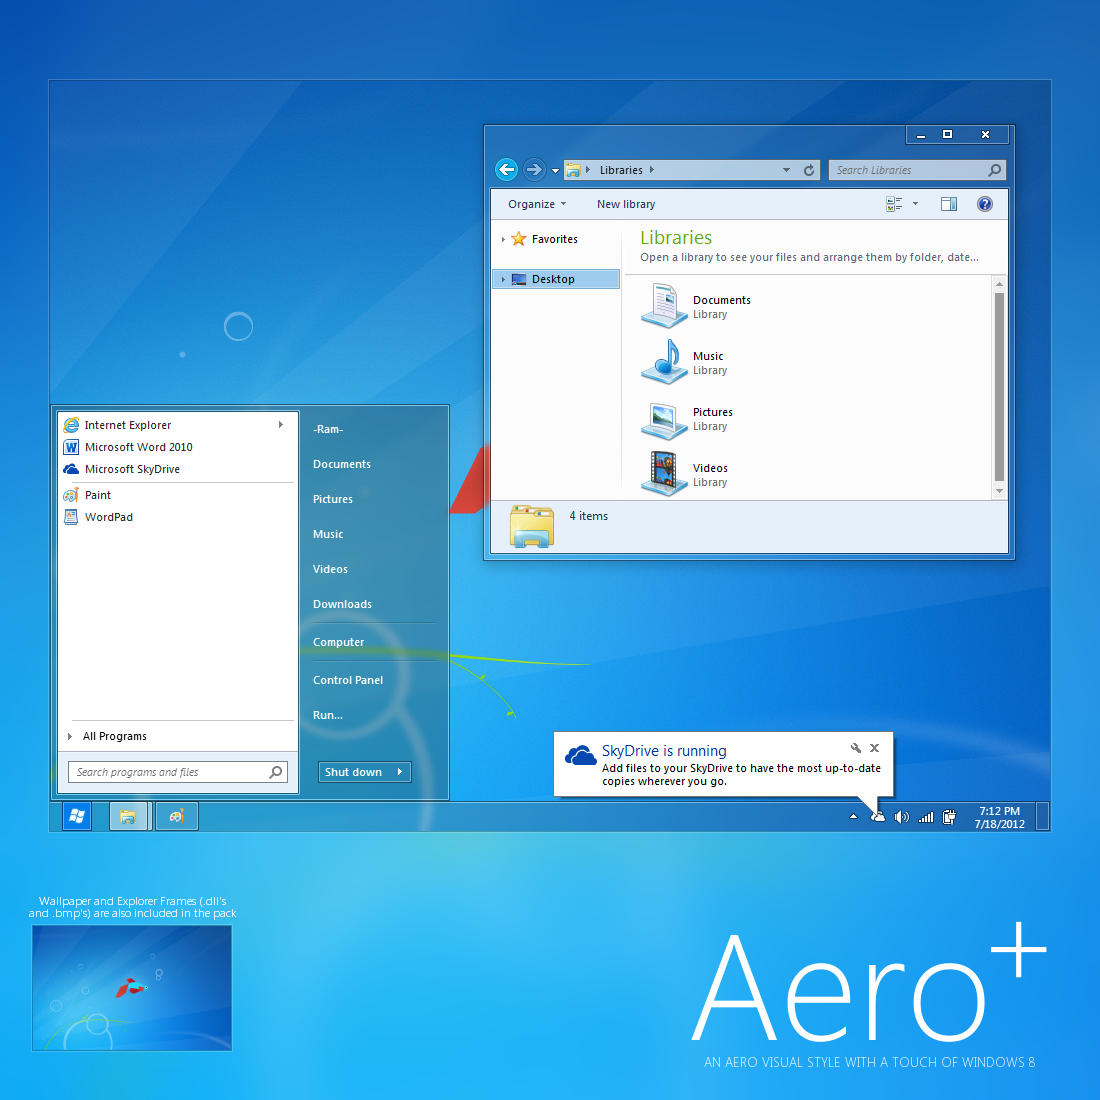 Classic 3d Desktop Workplace Wallpaper Aero By Giro54 On Deviantart